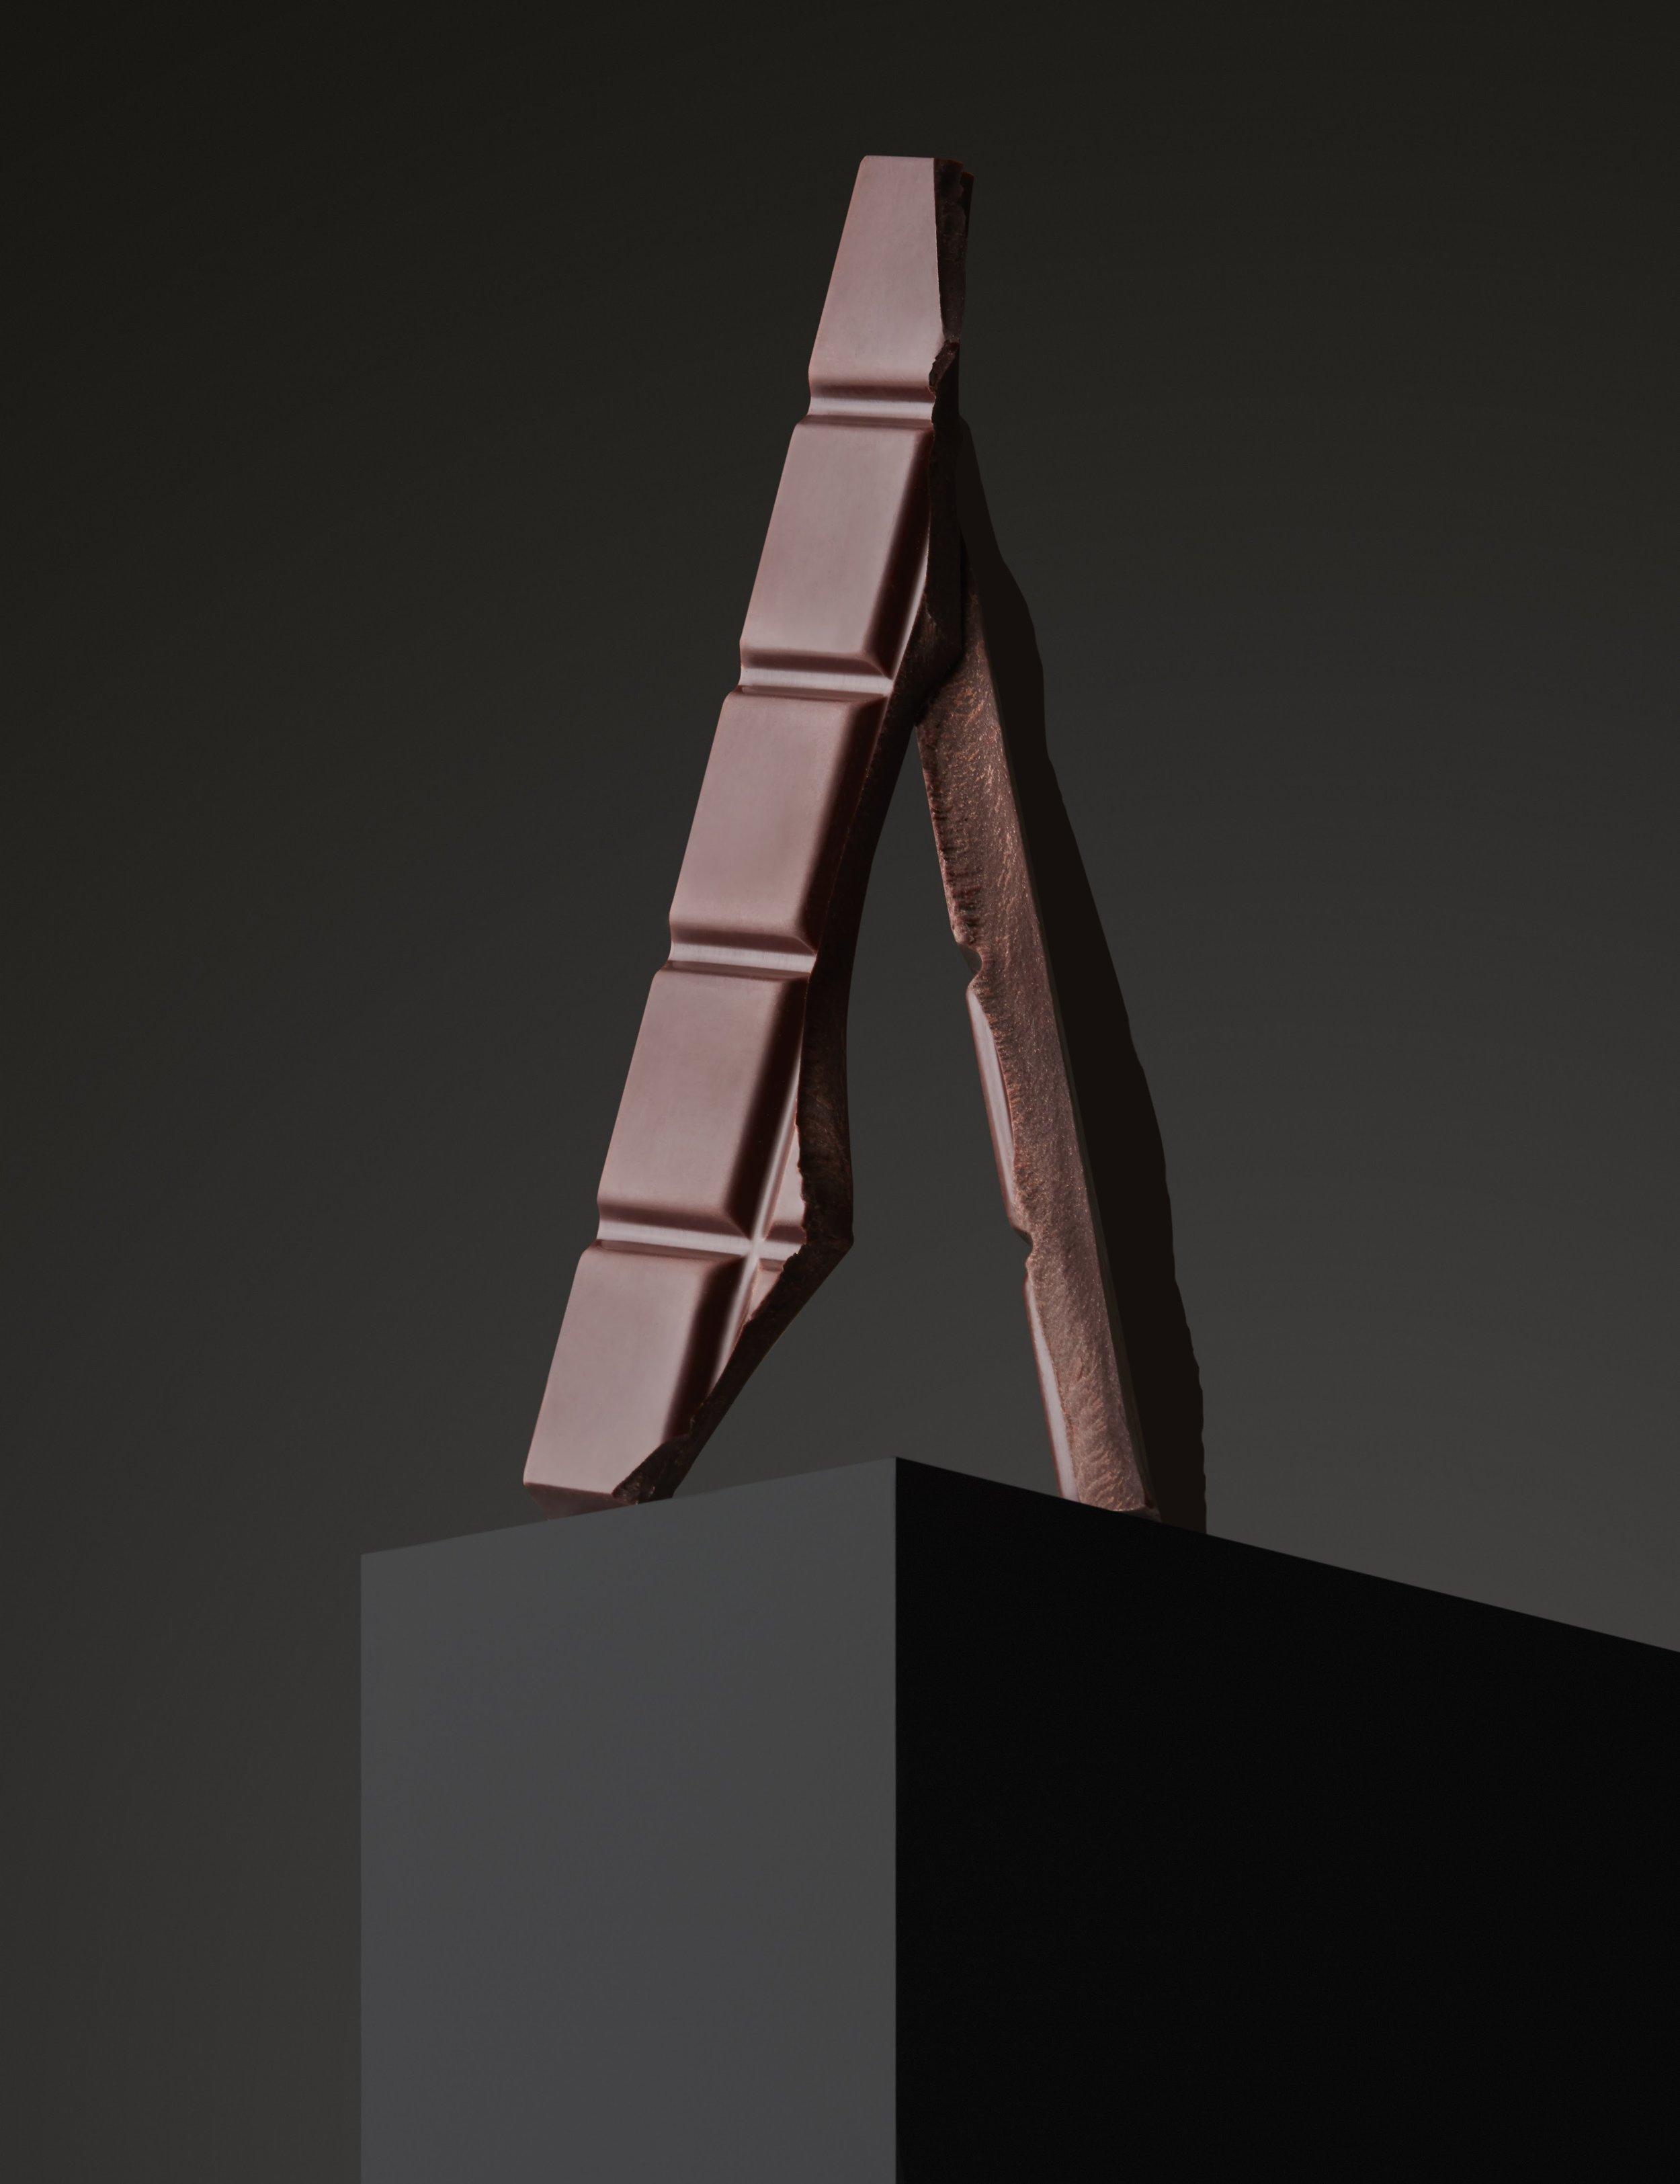 Zuki_Turner_Creative Direction_chocolate-architecture-still-life-photography-3.jpg